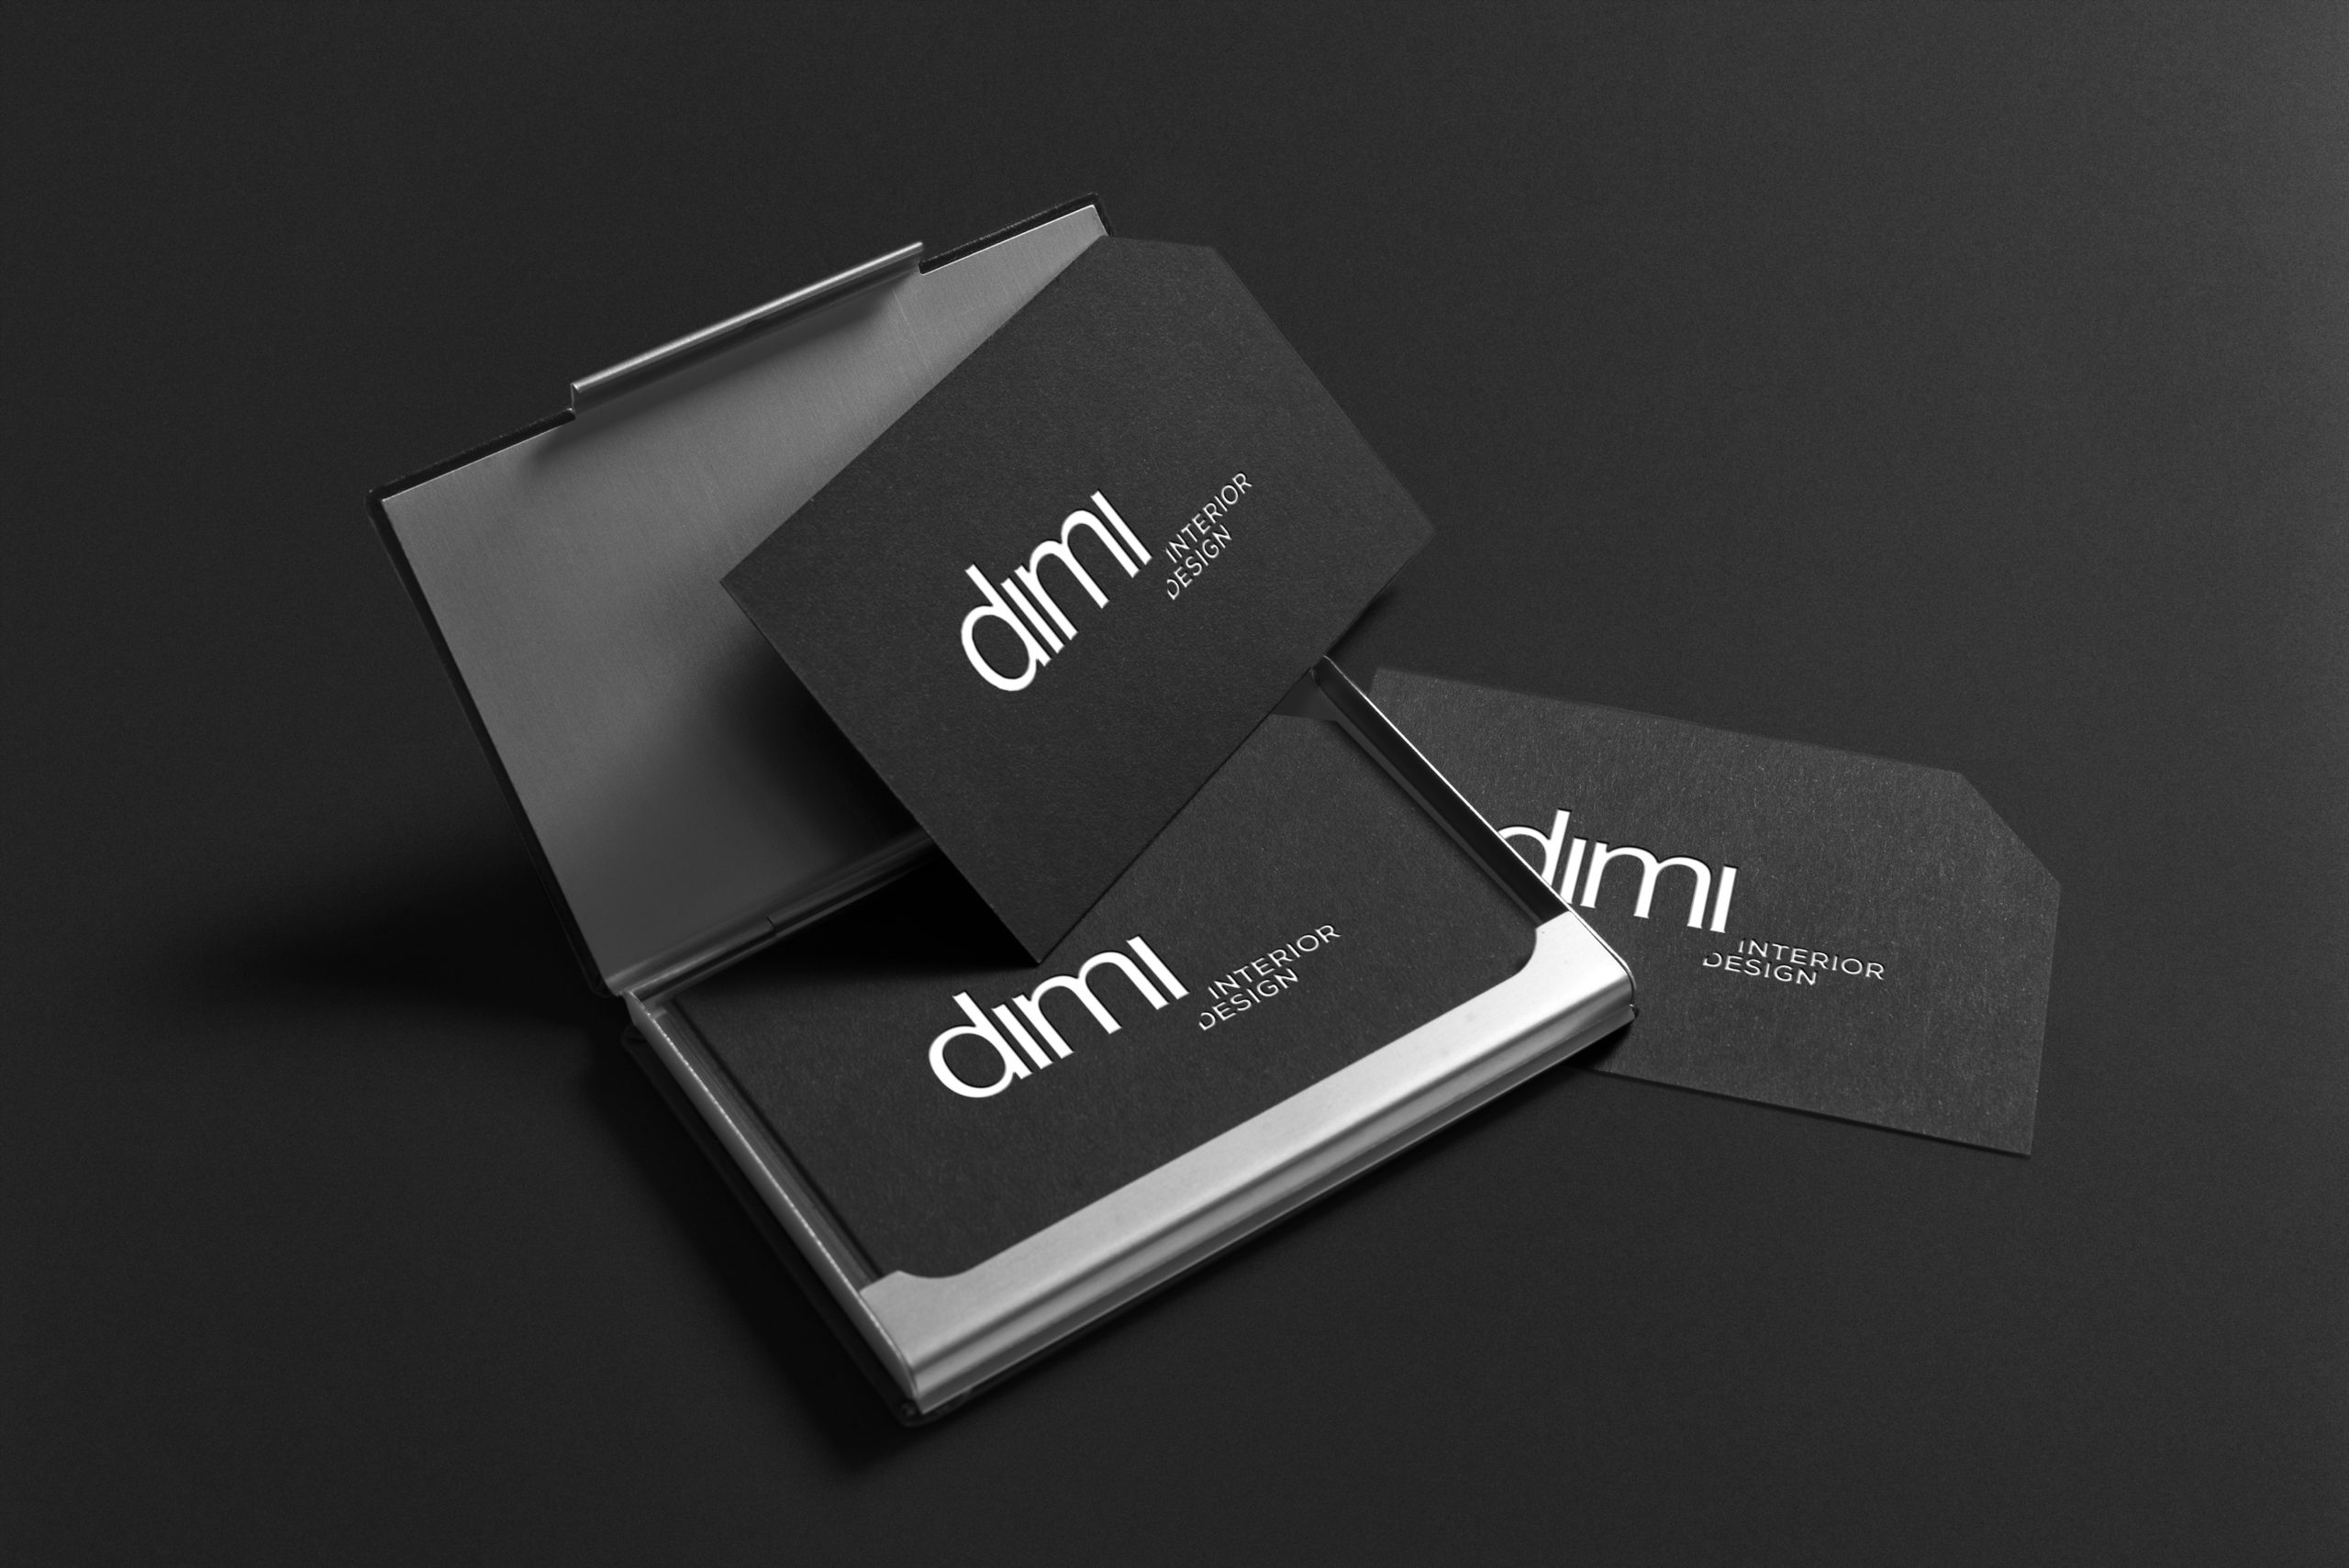 Papeterie - Dimi interior Design - Identité visuelle - Damien Rossier Graphisme